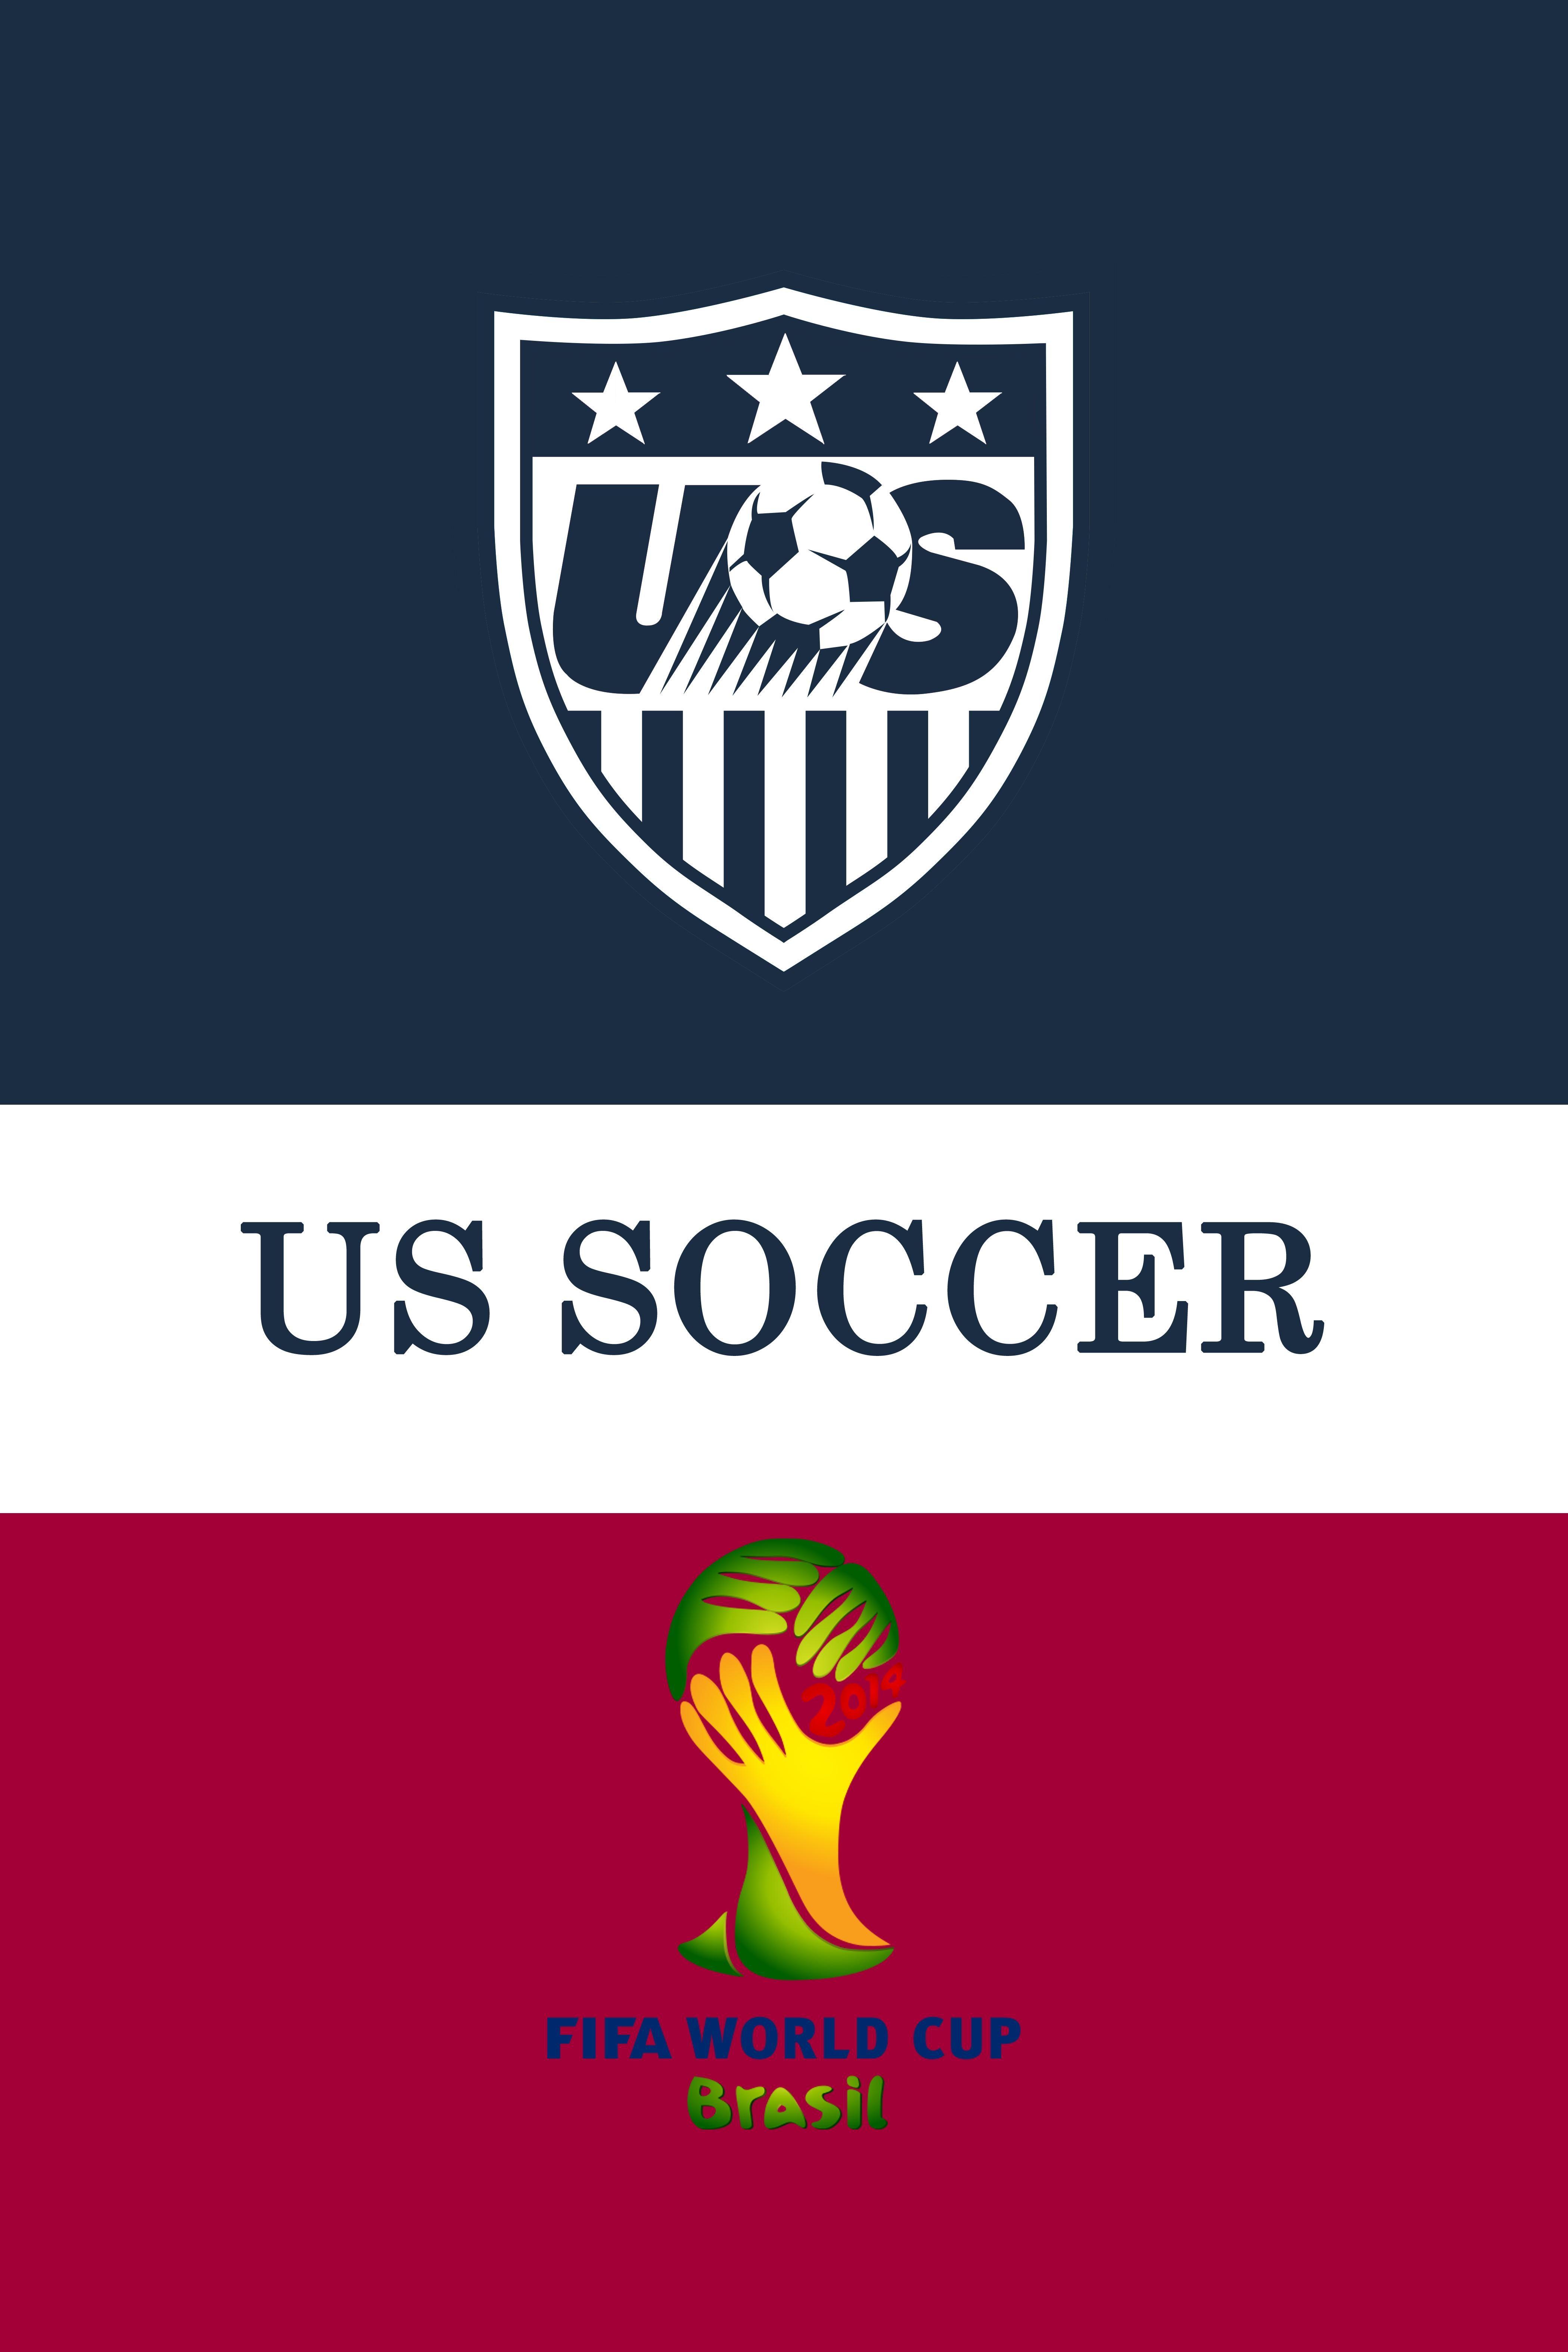 45 U S Soccer Wallpapers Download At Wallpaperbro Team Wallpaper Logo Wallpaper Hd Soccer